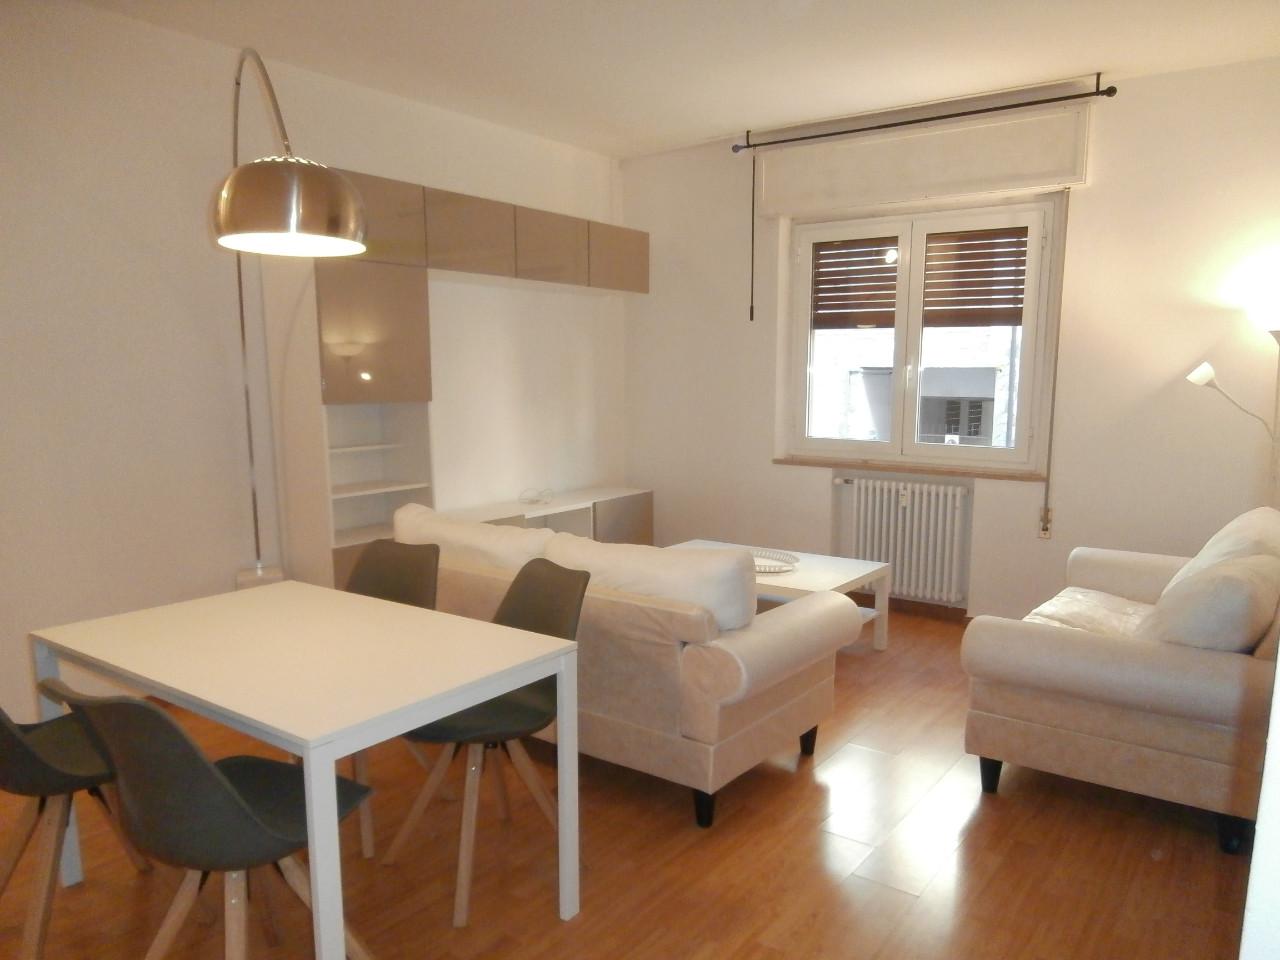 Appartamento, 80 Mq, Affitto - Ferrara (Ferrara)